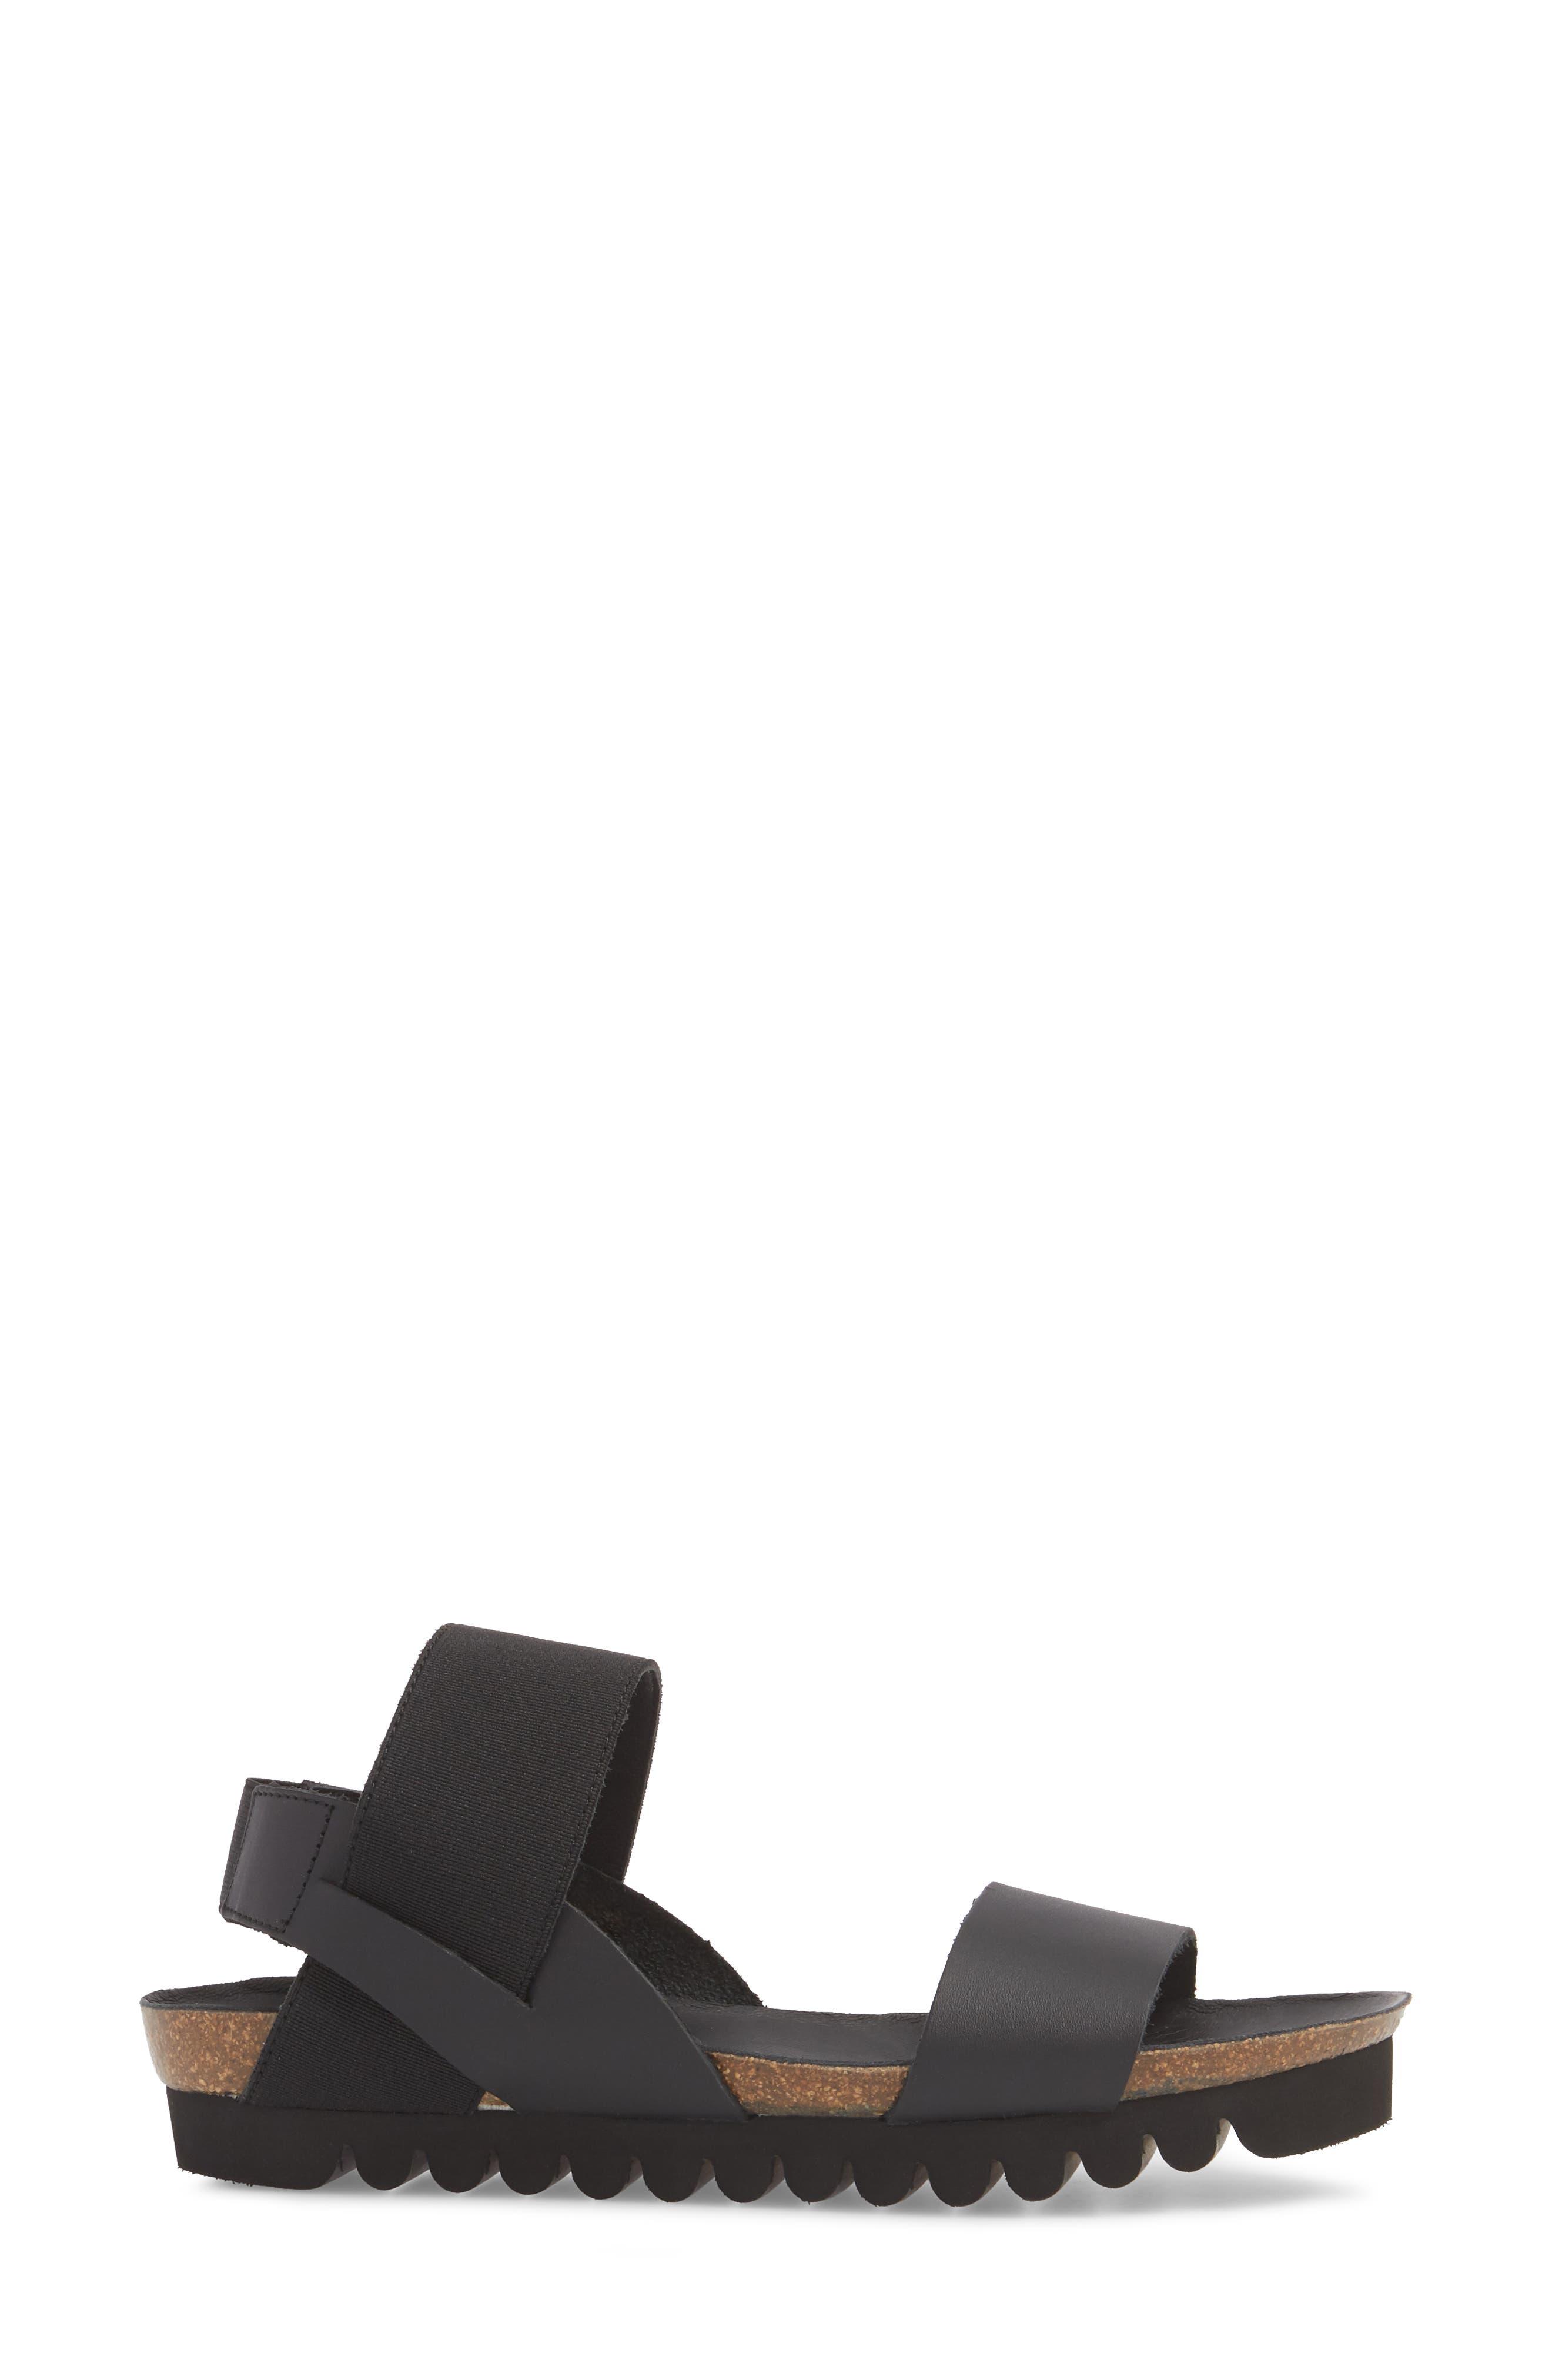 Luna Sandal,                             Alternate thumbnail 3, color,                             Black Leather